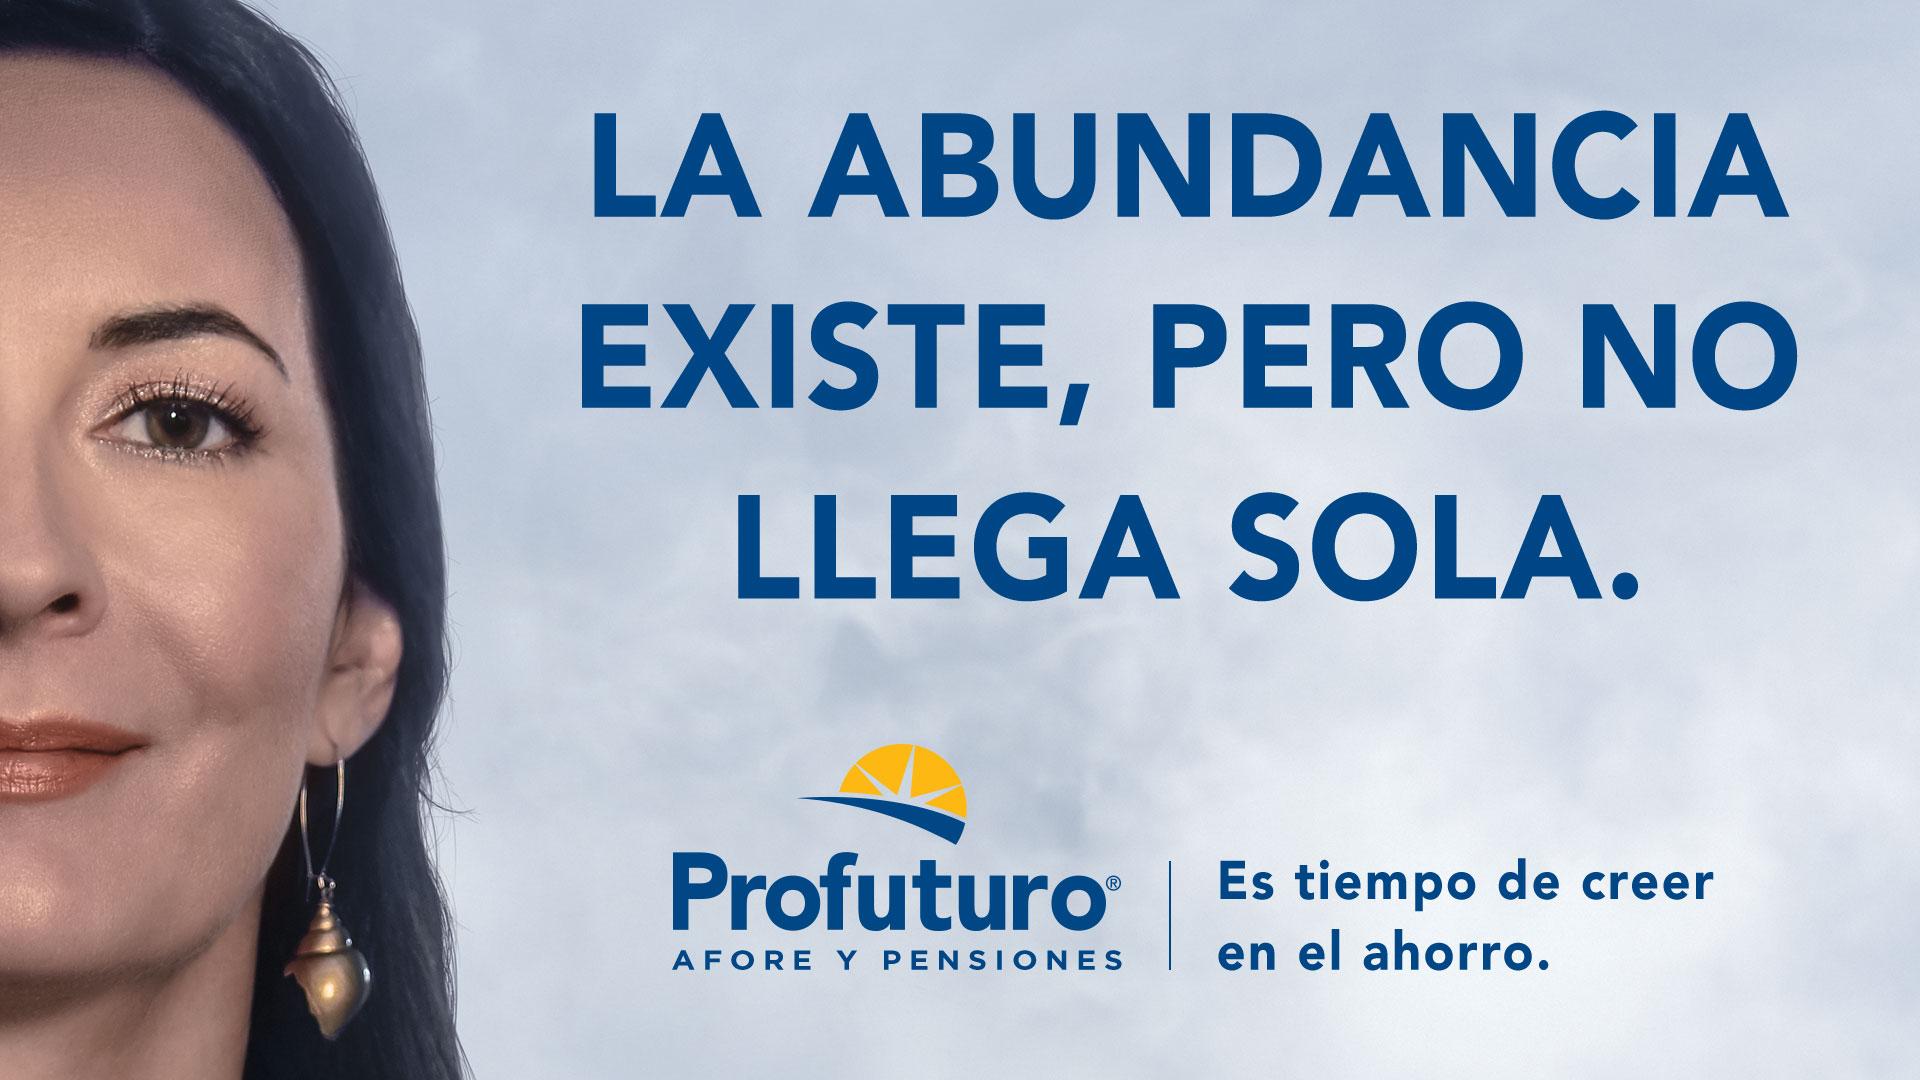 Abundancia_profuturo_1920_1080